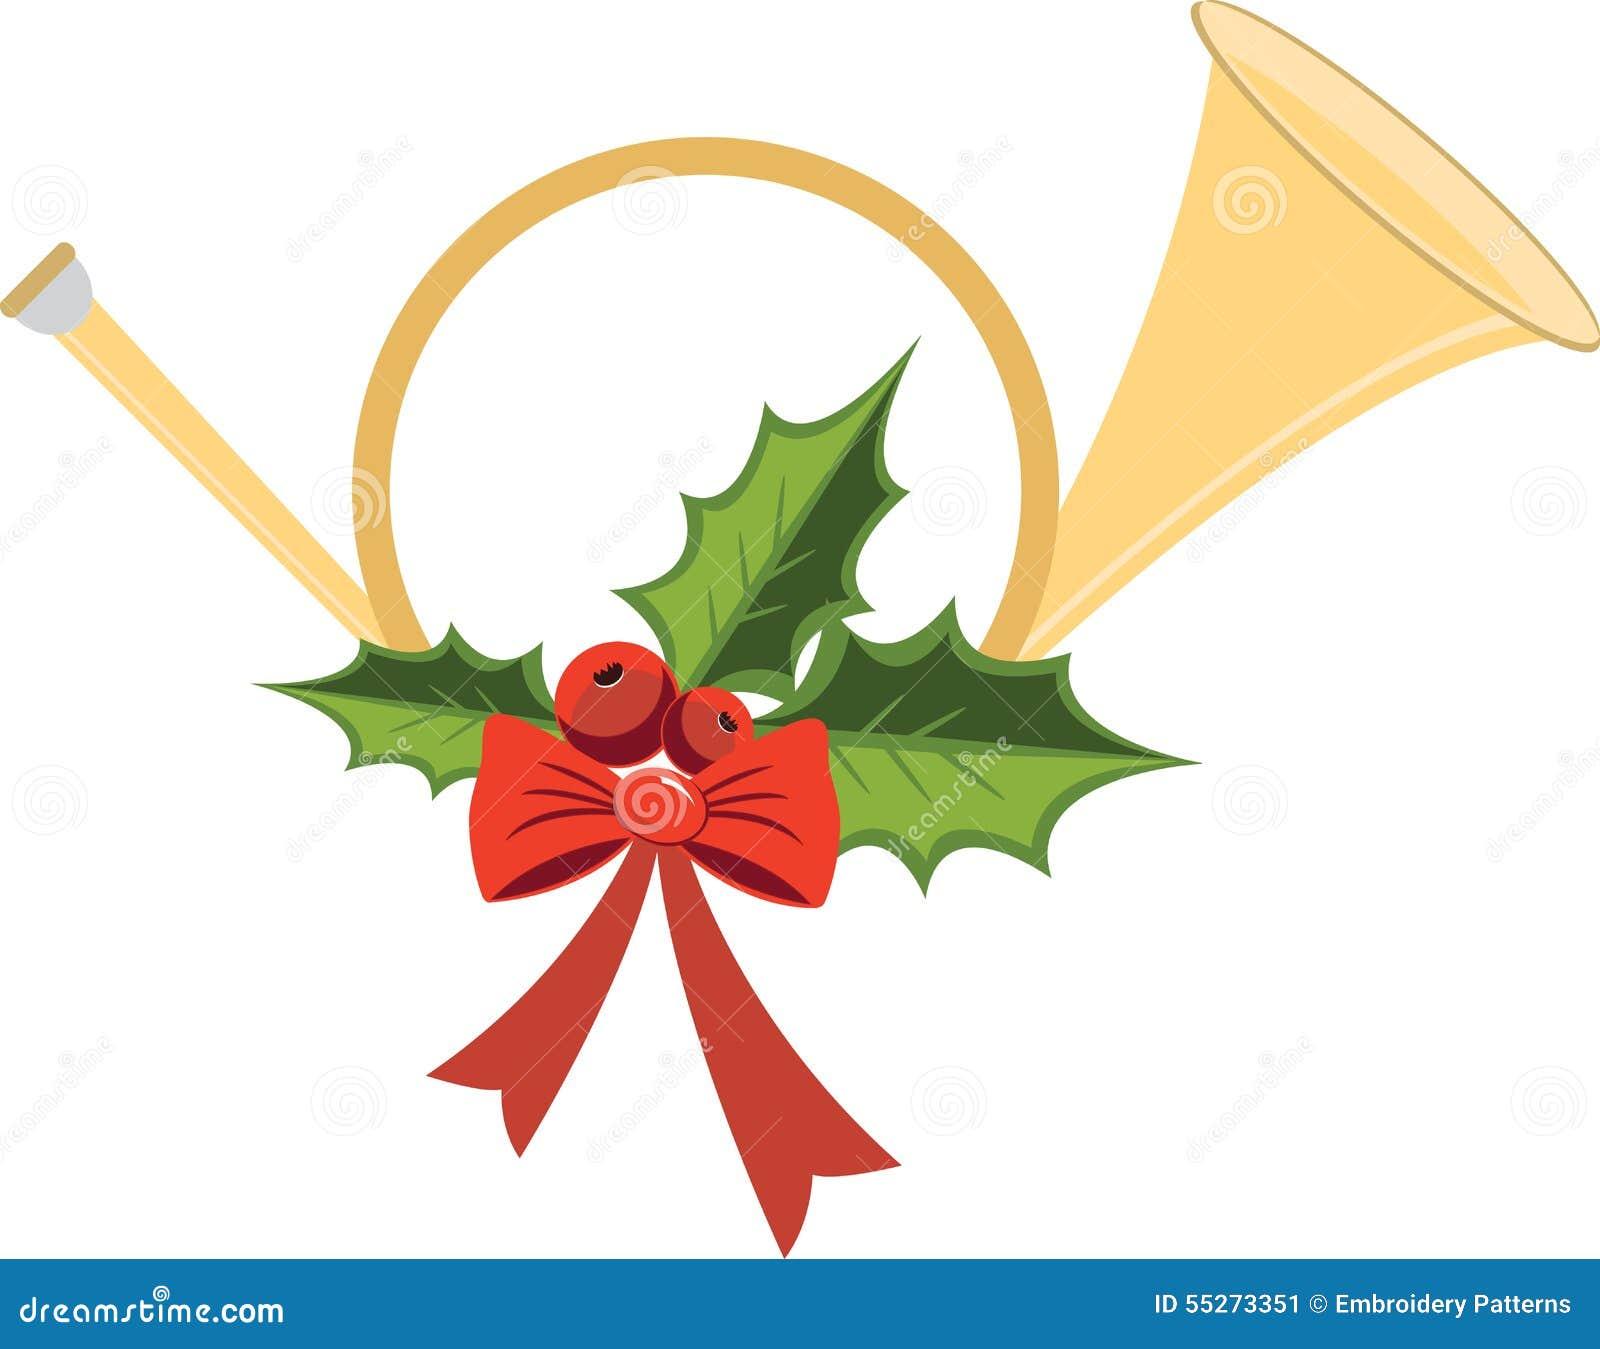 Stock Image: Christmas Bugle. Image: 55273351